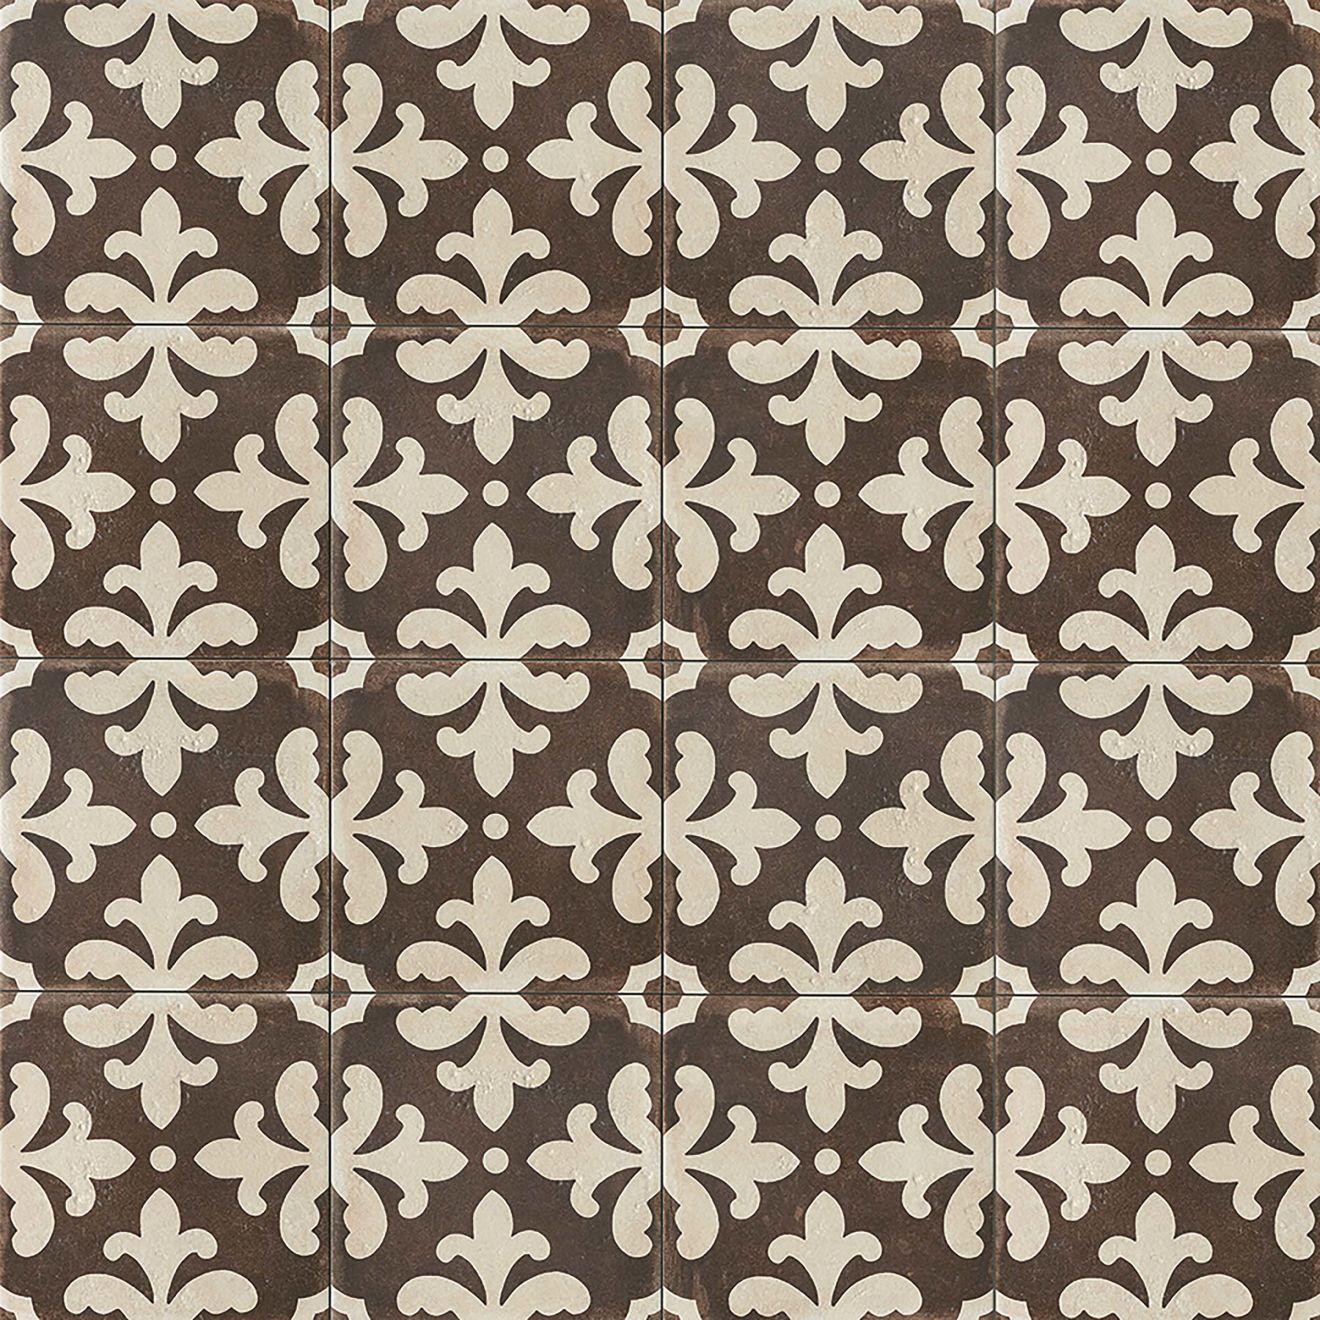 "Palazzo 12"" x 12"" Decorative Tile in Antique Cotto Florentina"